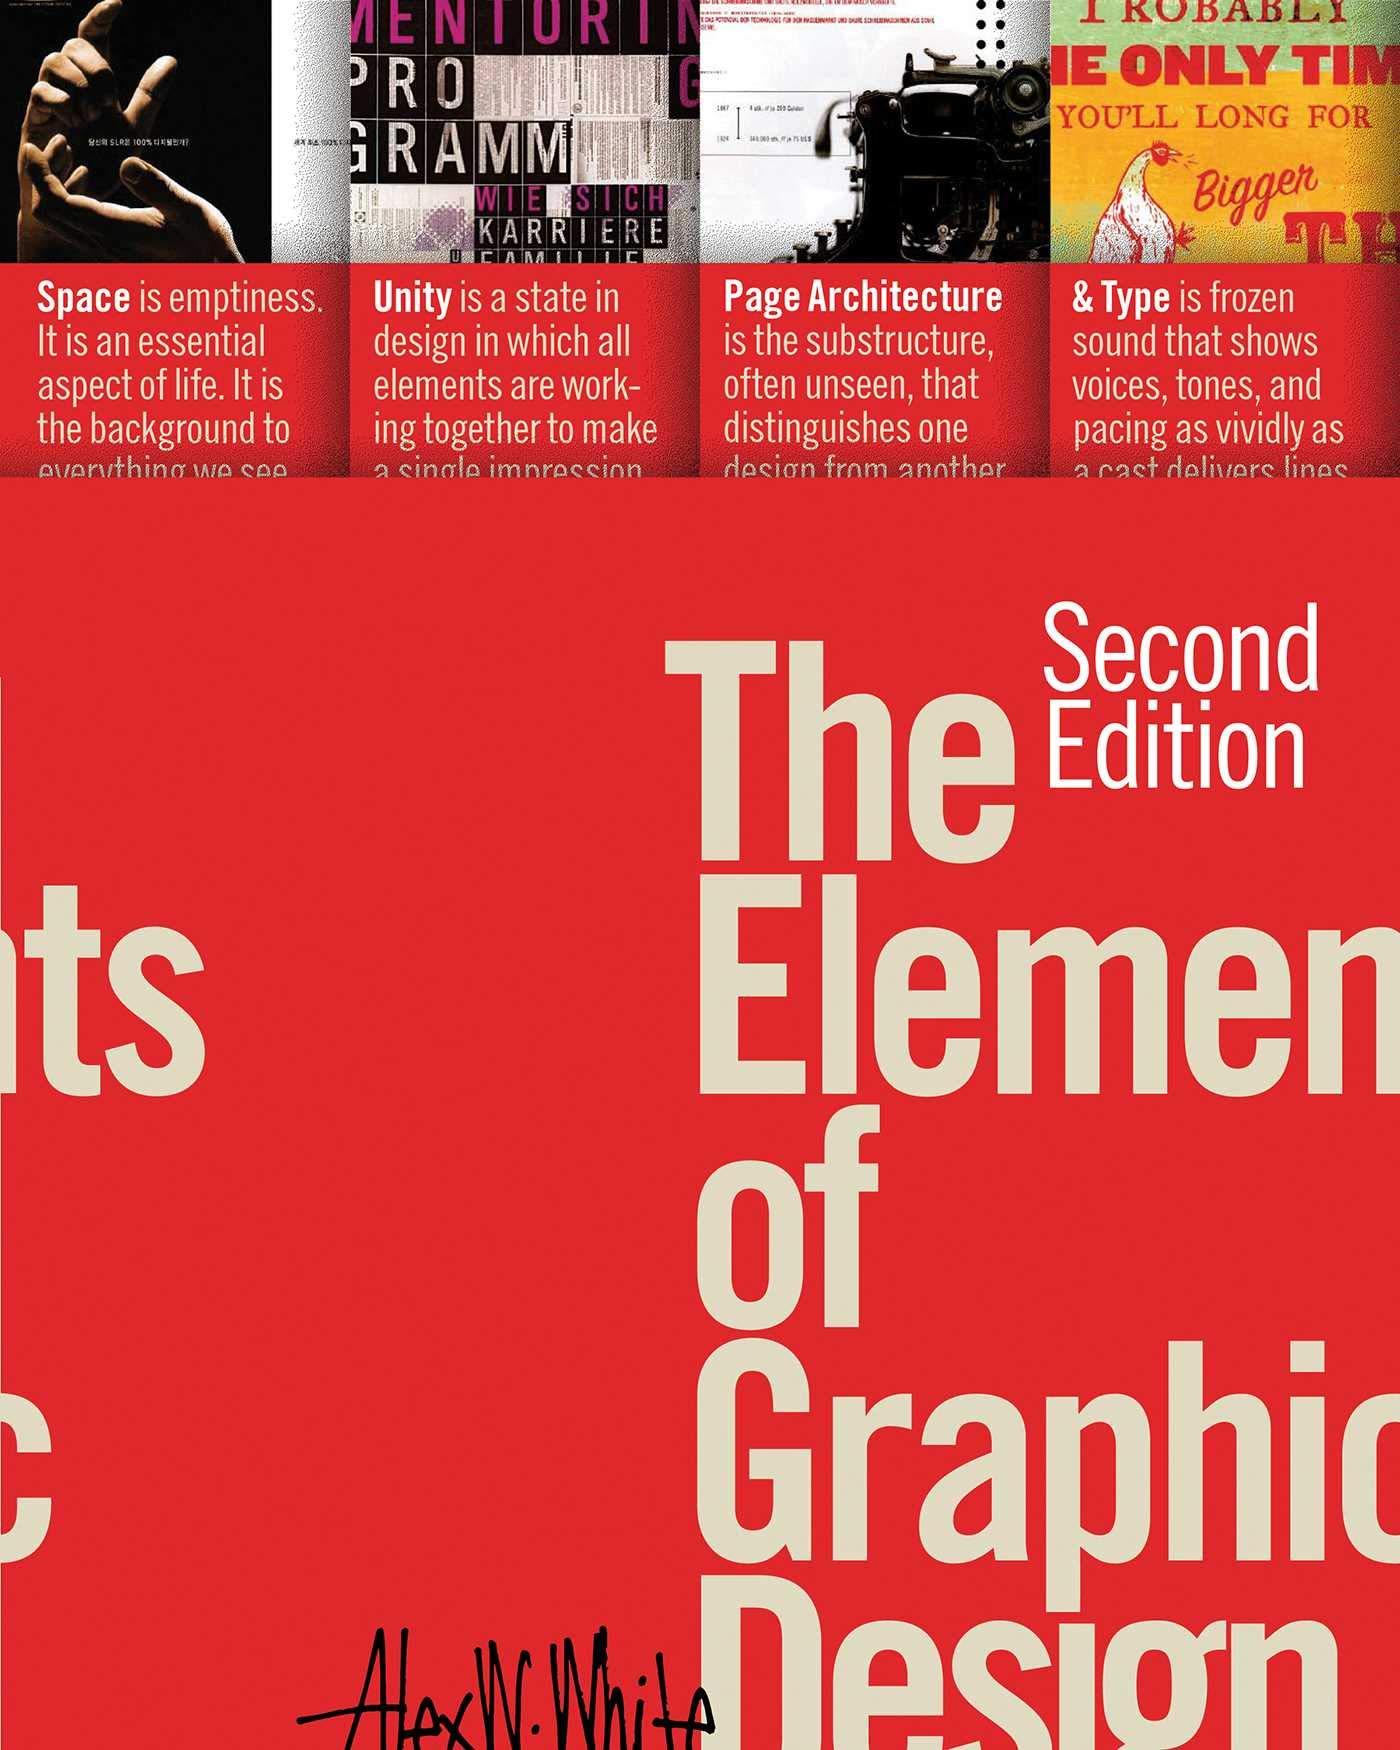 Dutone. Limted Colour Schemes in Graphic Design